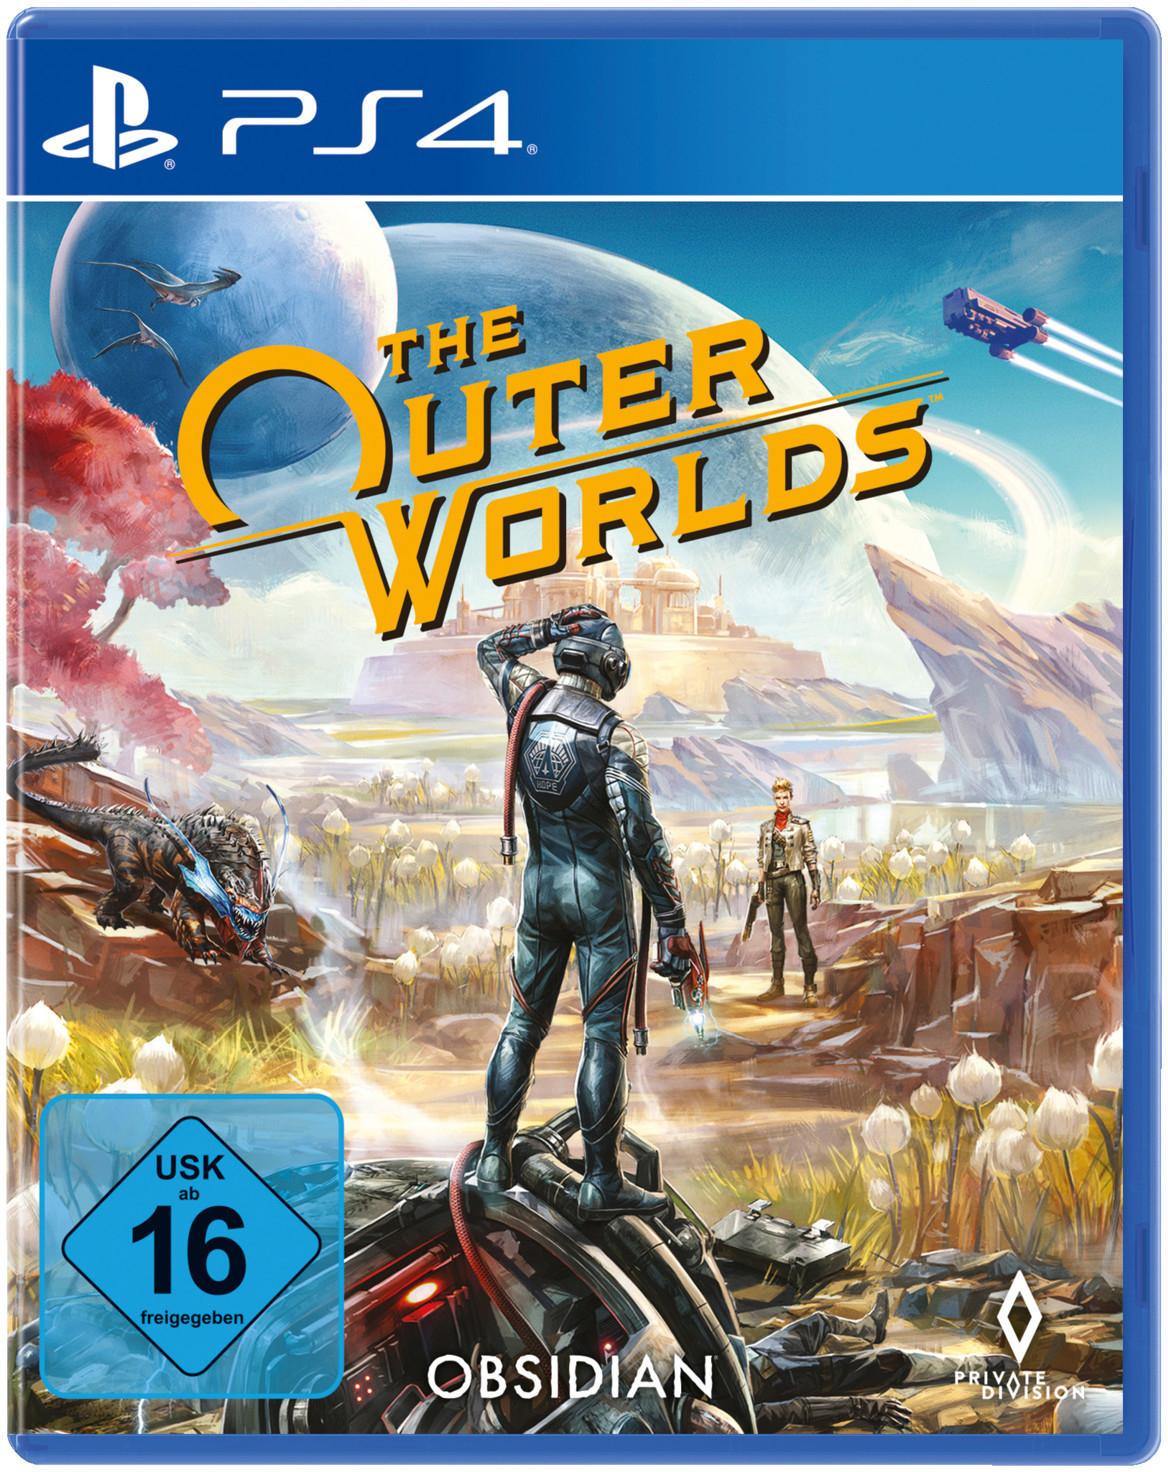 GDD Gaming: z.B. The Outer Worlds für 25€ bei Marktabholung [PS4 & Xbox One] | Sid Meier's Civilization VI - 25€ | NBA 2K20 - 16€